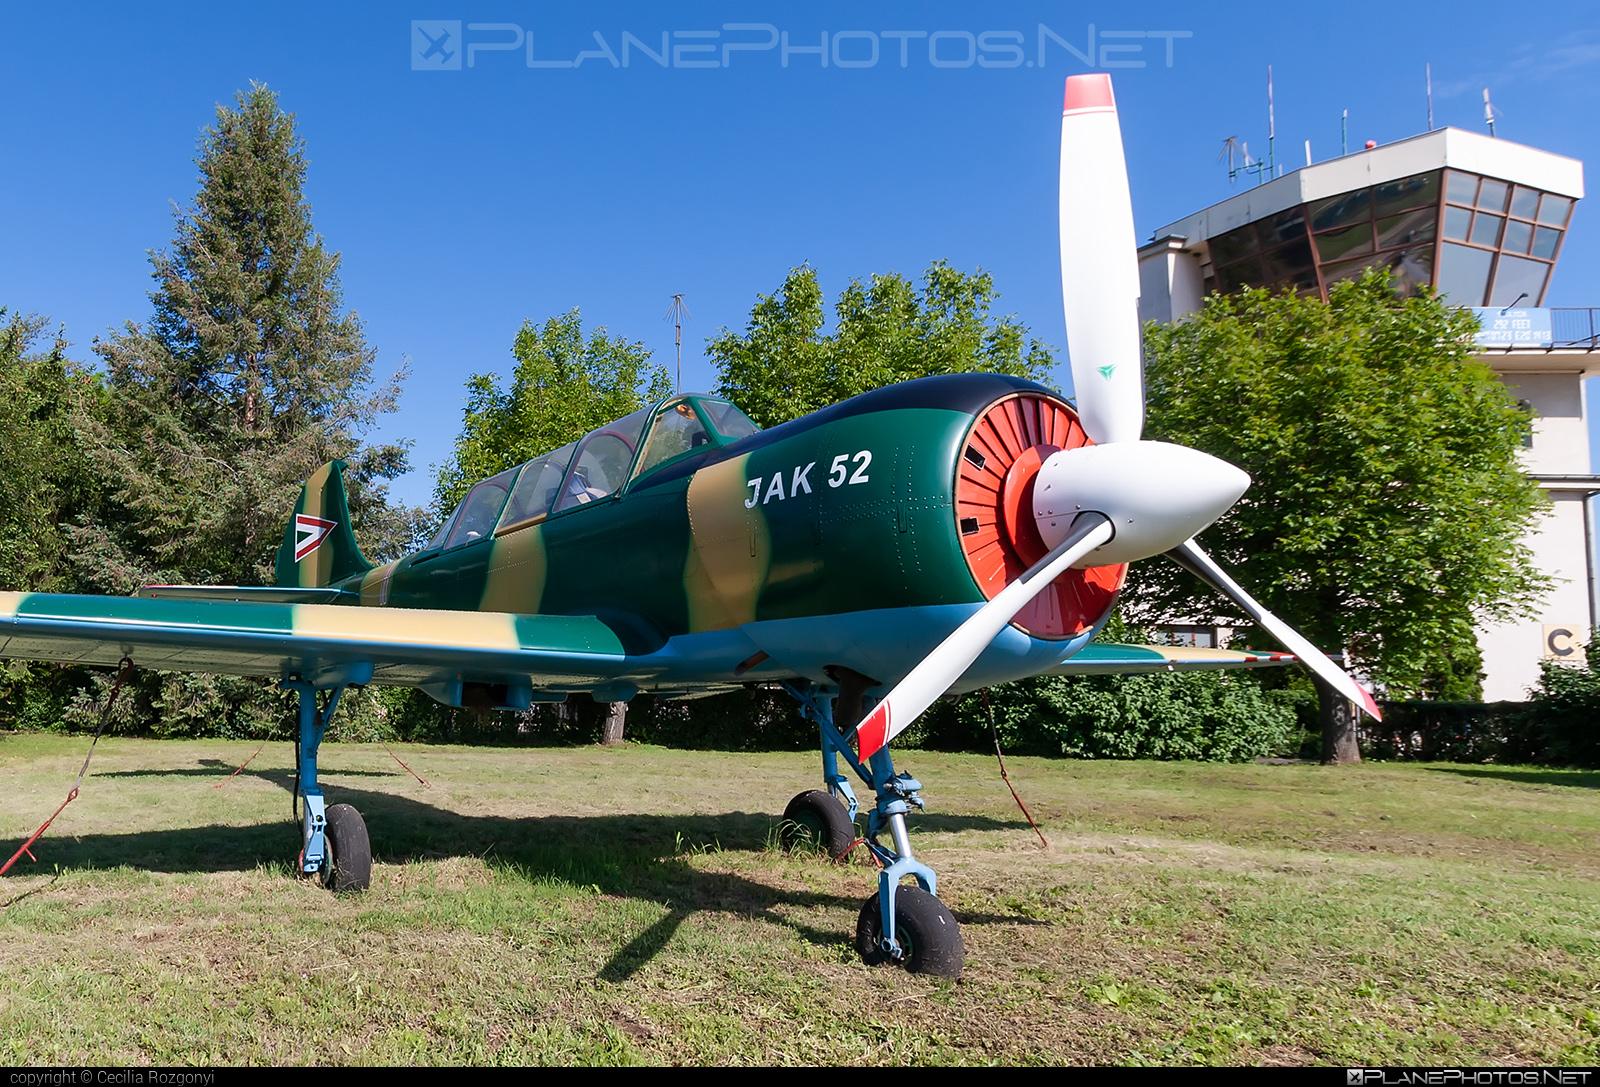 Yakovlev Yak-52 - 11 operated by Magyar Légierő (Hungarian Air Force) #hungarianairforce #magyarlegiero #yak #yak52 #yakovlev